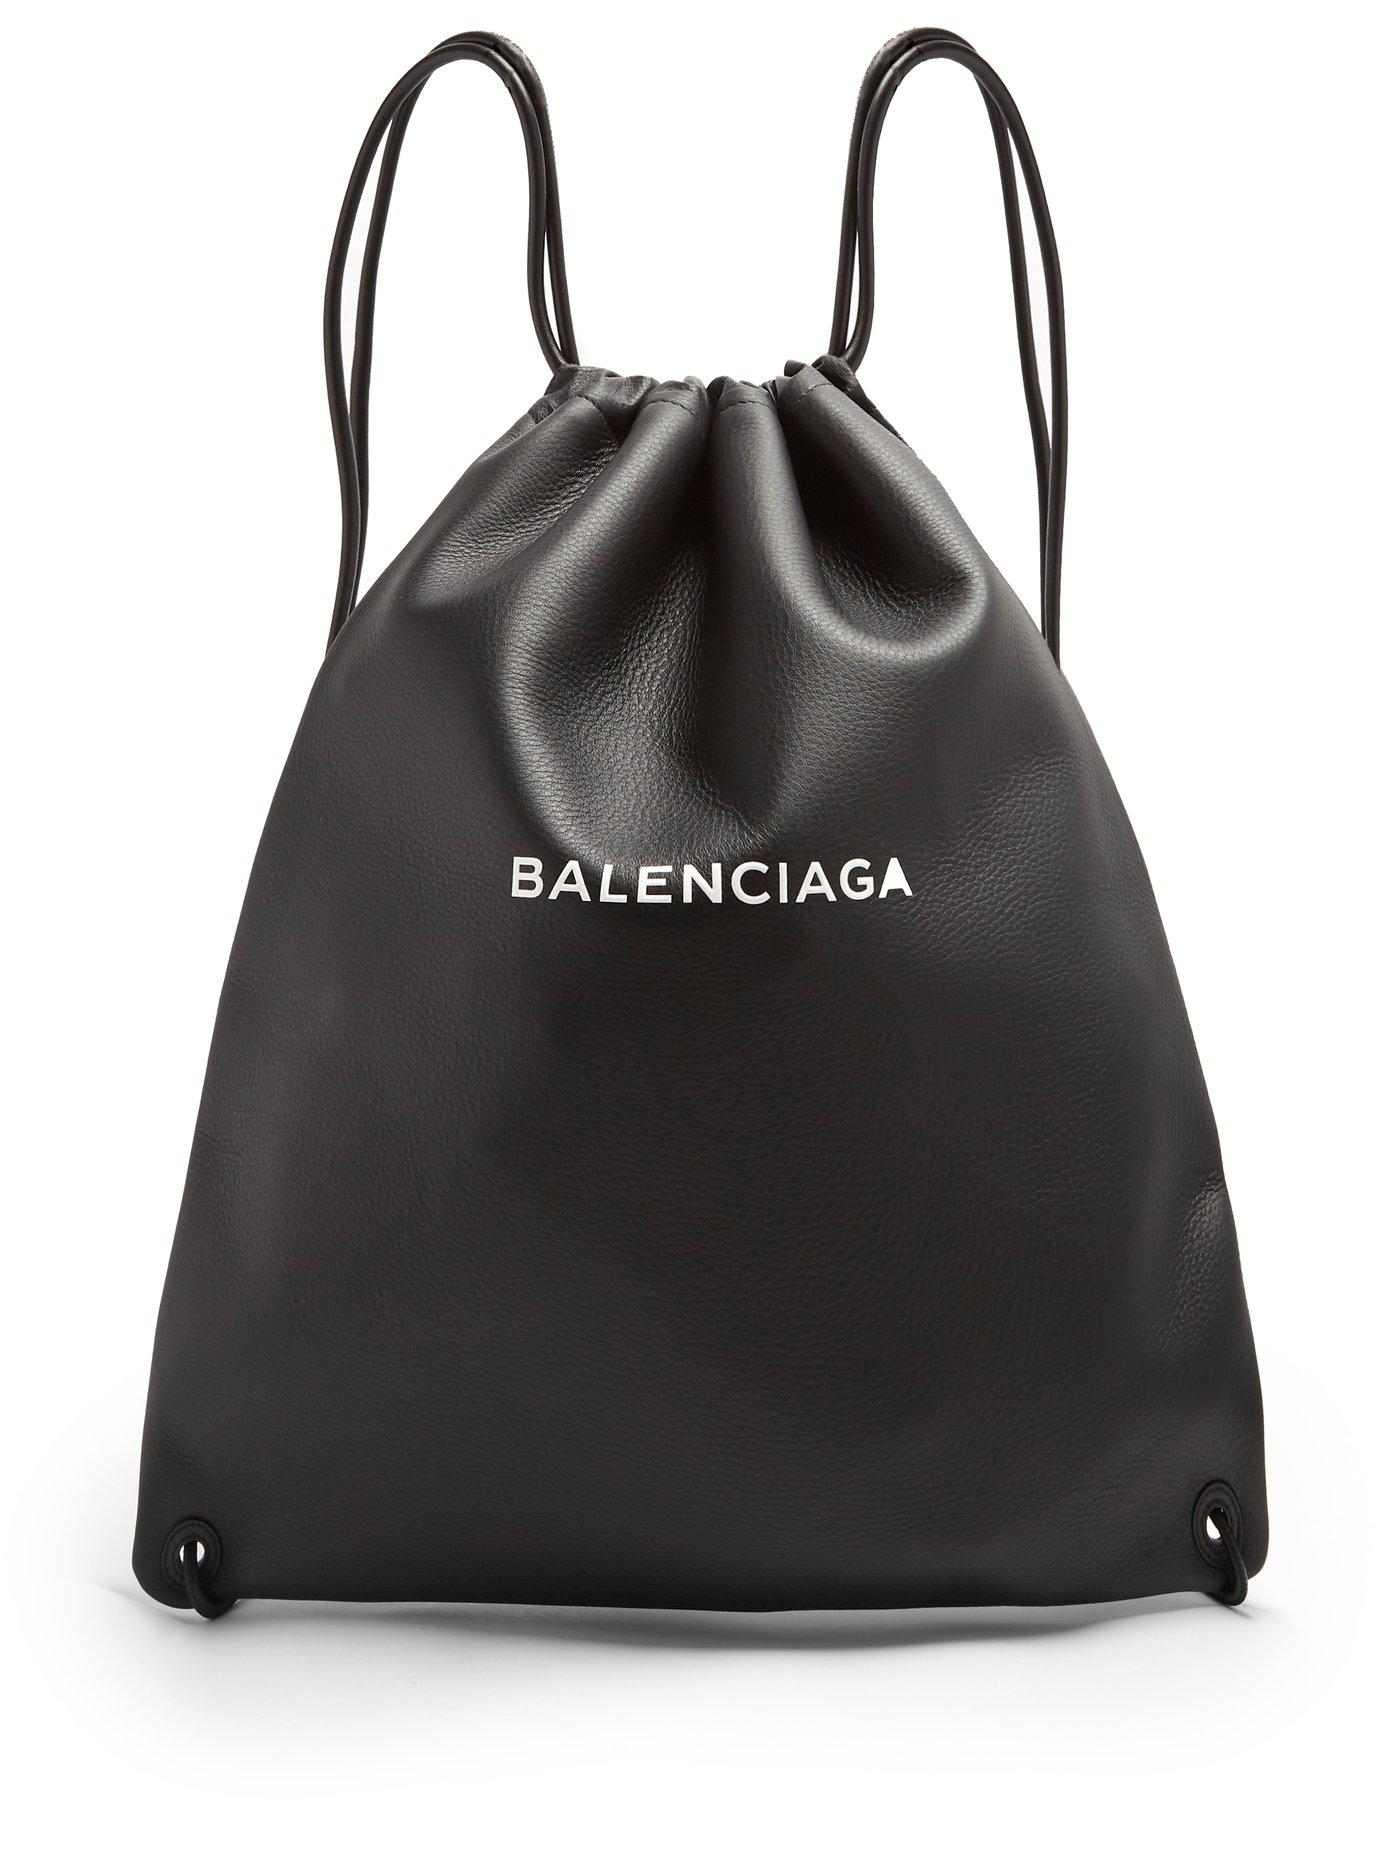 Lyst - Sac à dos en cuir à cordon coulissant et logo Balenciaga pour ... 0ddbb62f7fc